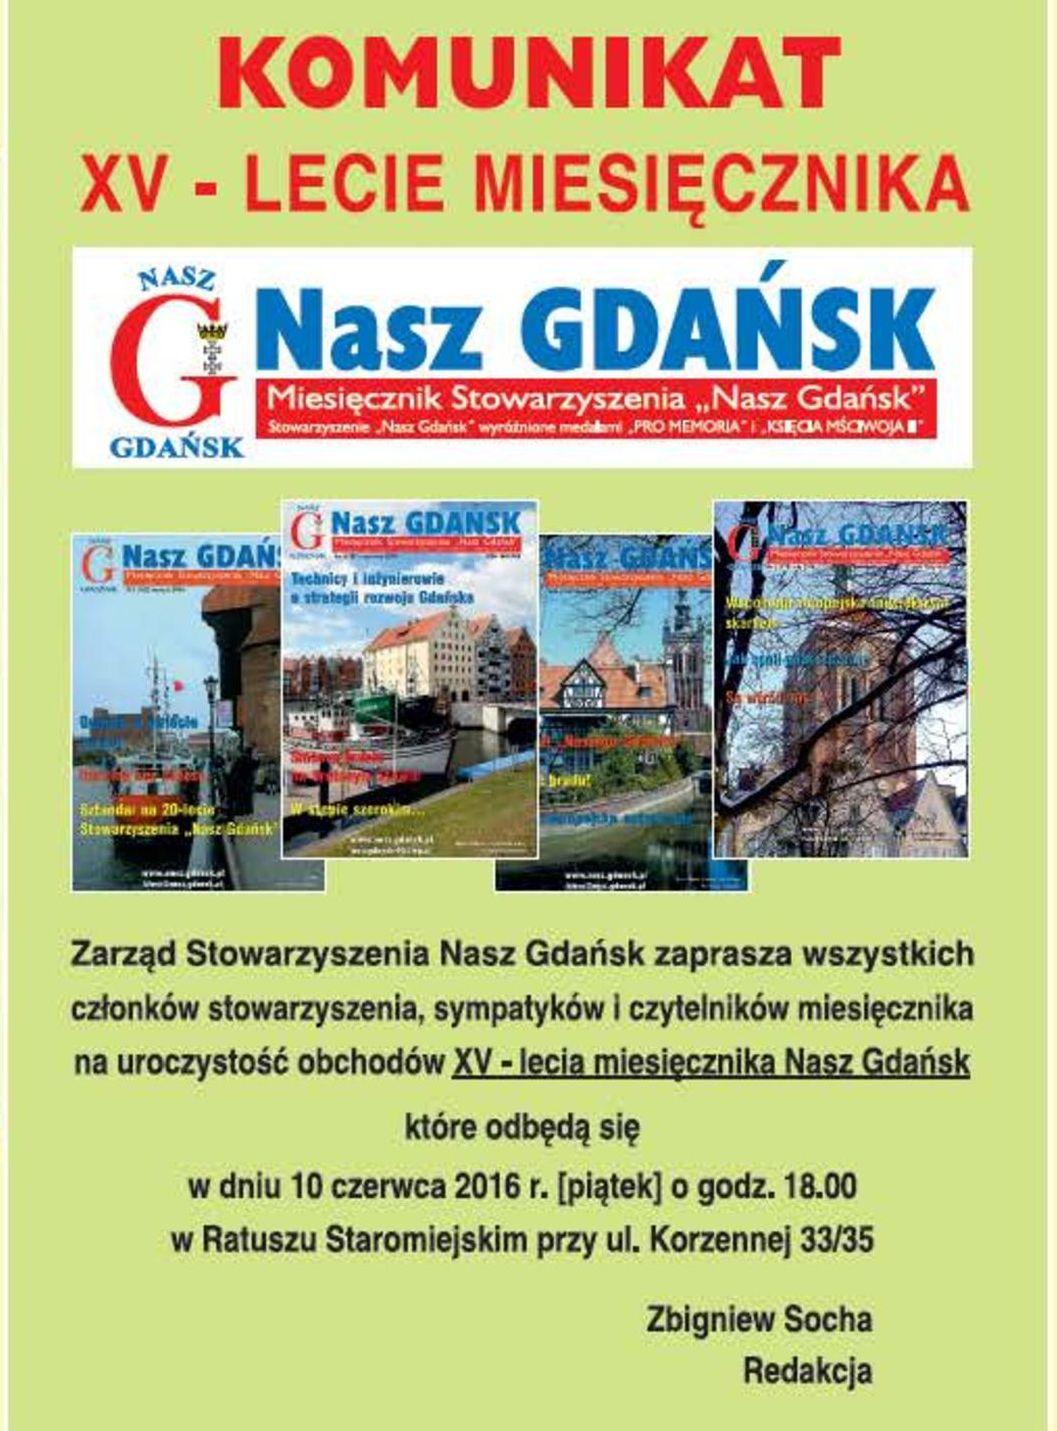 NG VI 2016 net 2-page-002 15-lecie zaproszenie